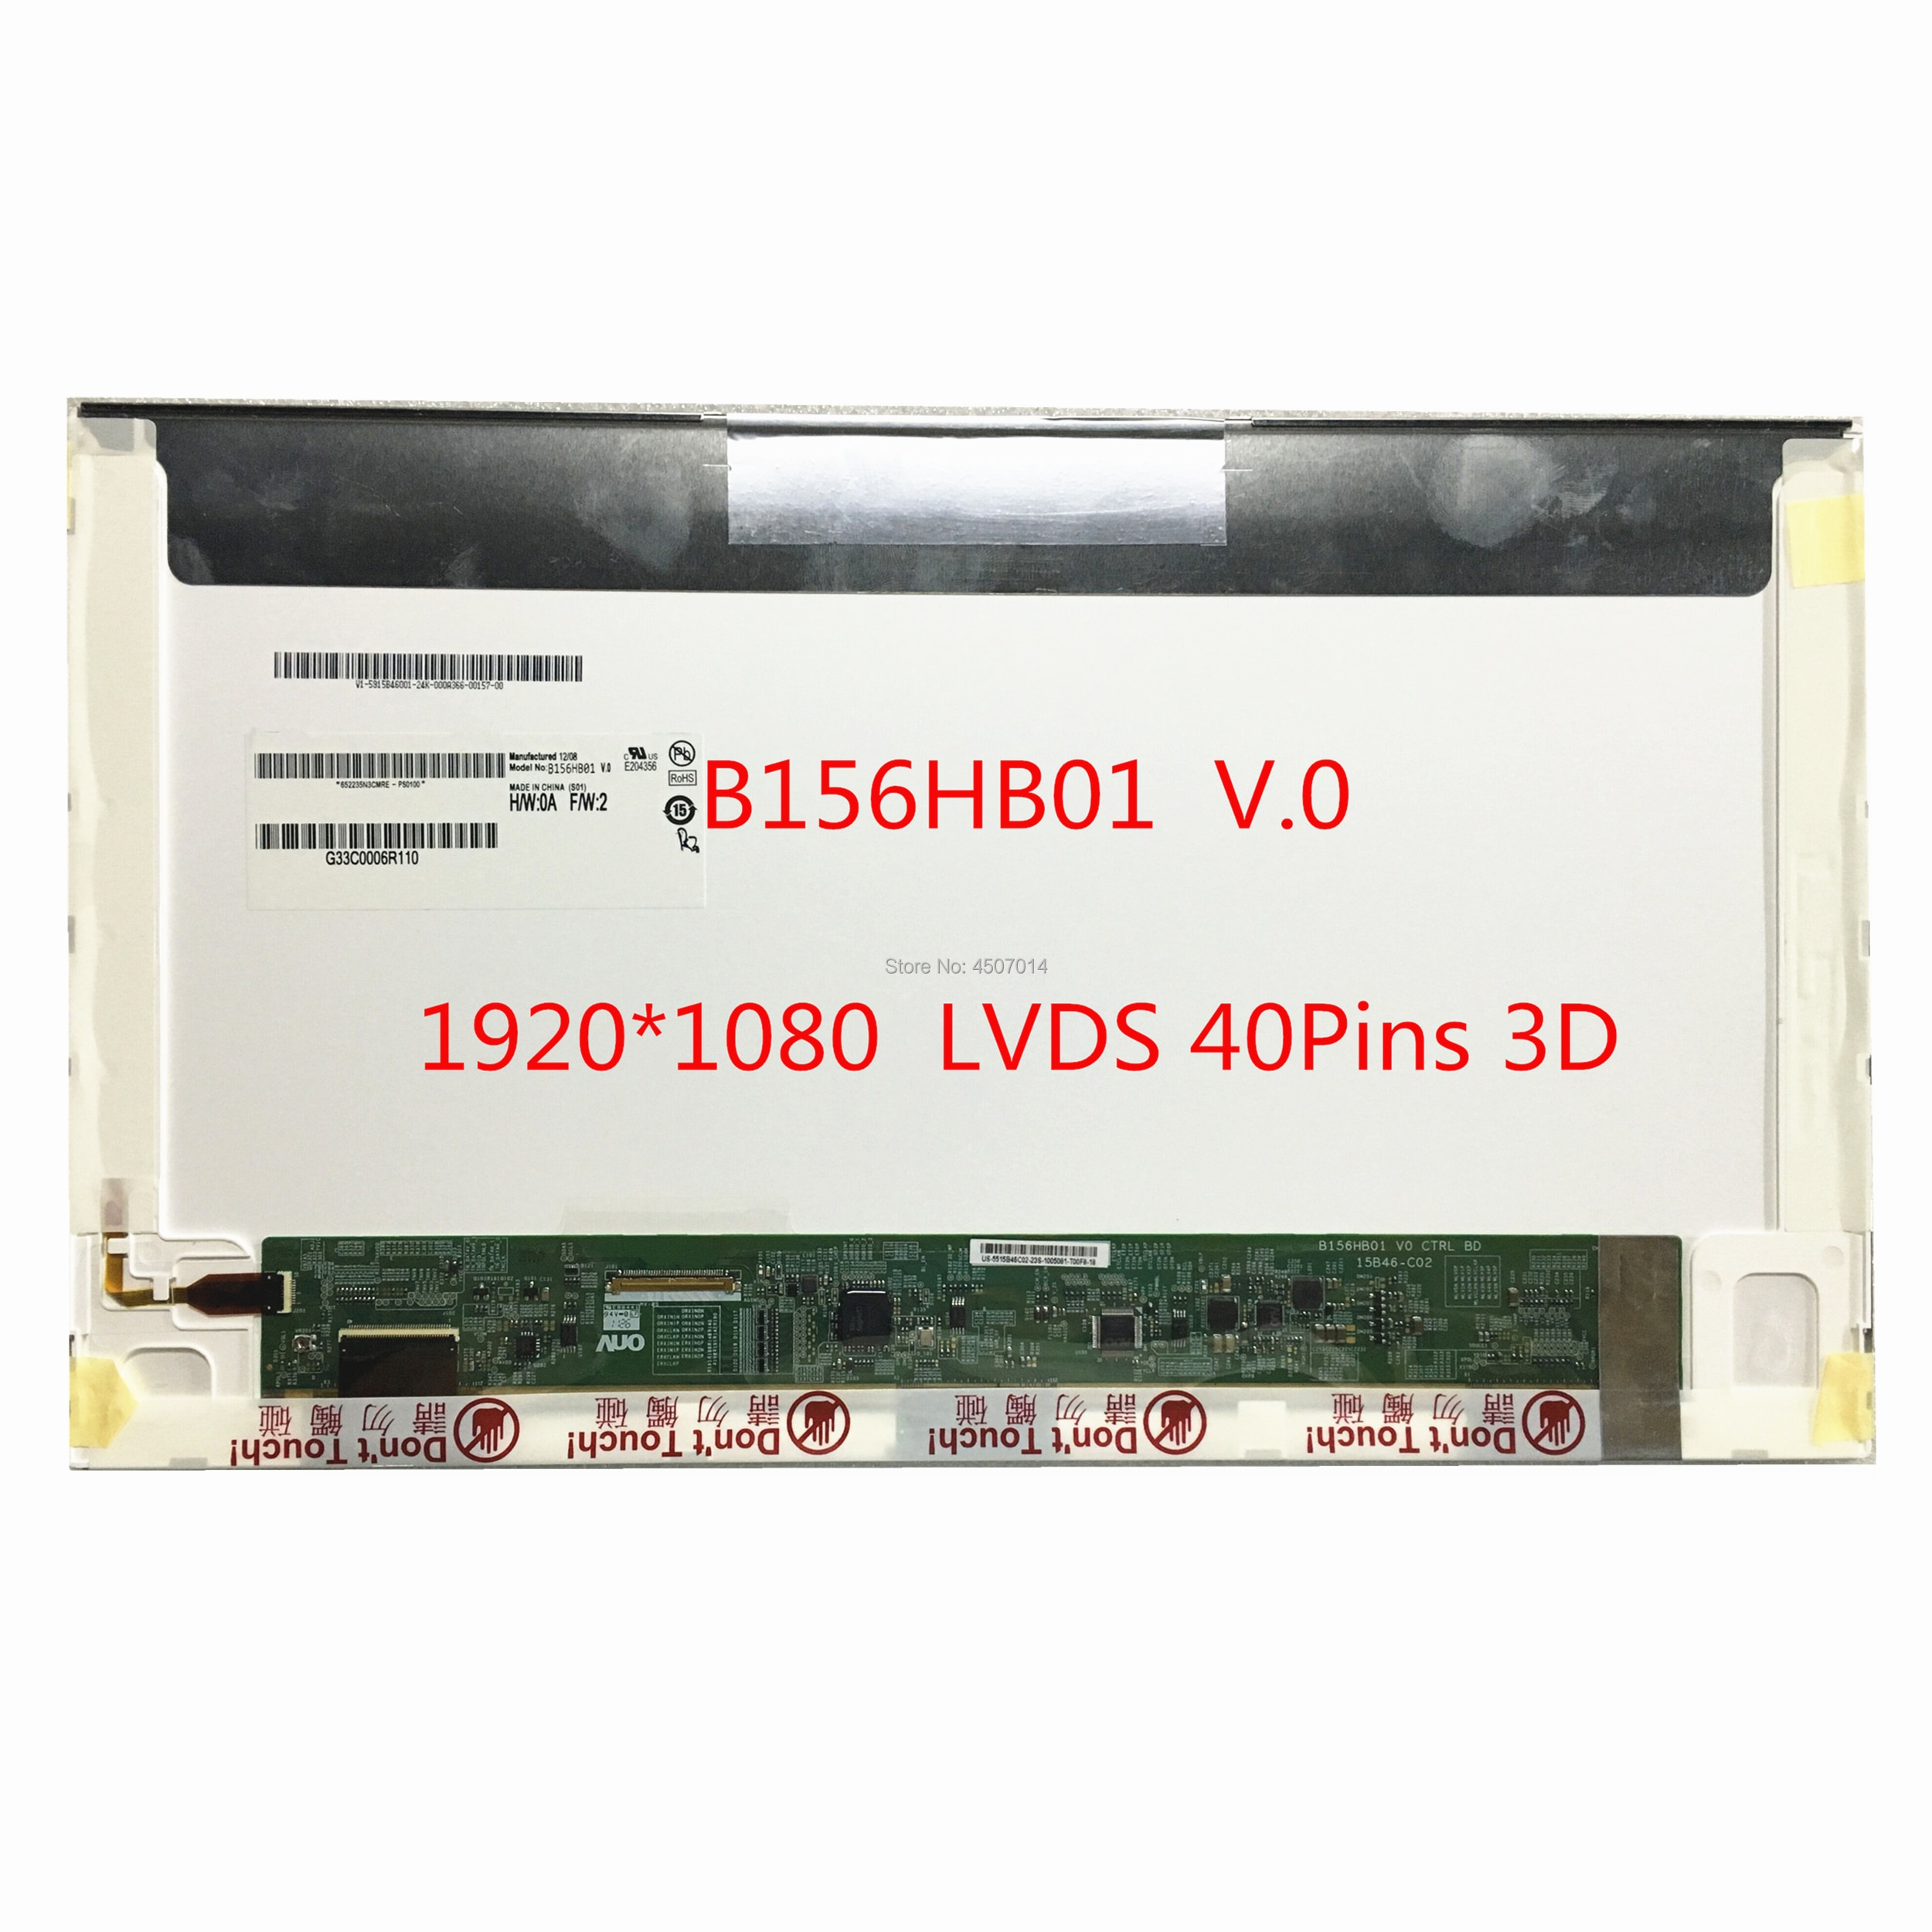 شحن مجاني B156HB01 V.0 B156HB01 V0 15.6 ''inch FHD 3D محمول Lcd شاشة 1920*1080 LVDS 40 دبابيس